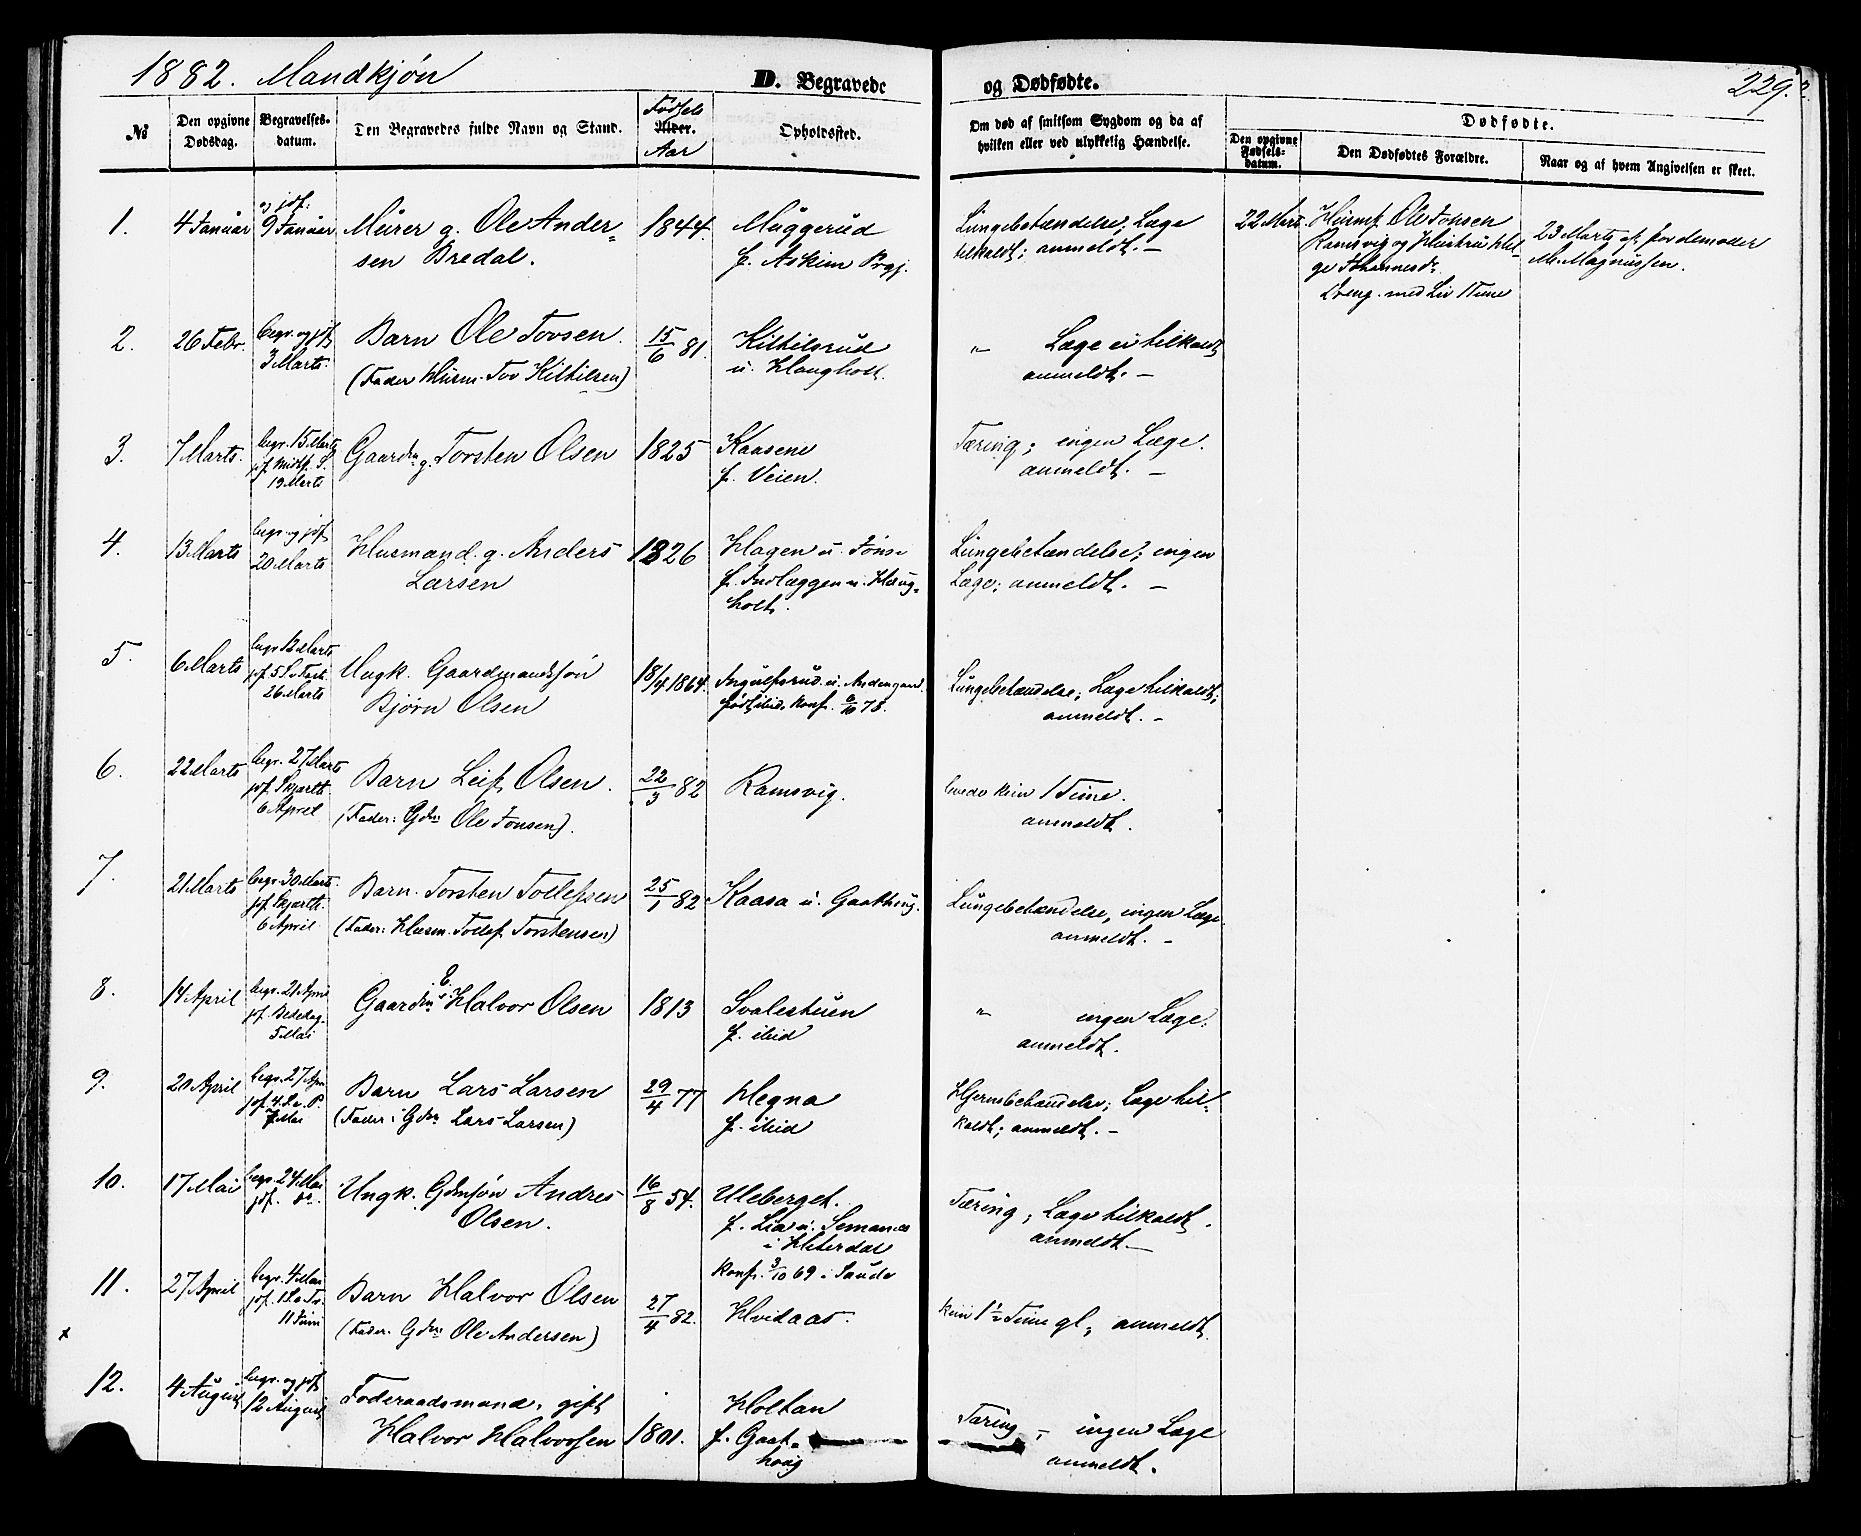 SAKO, Sauherad kirkebøker, F/Fa/L0008: Ministerialbok nr. I 8, 1873-1886, s. 229